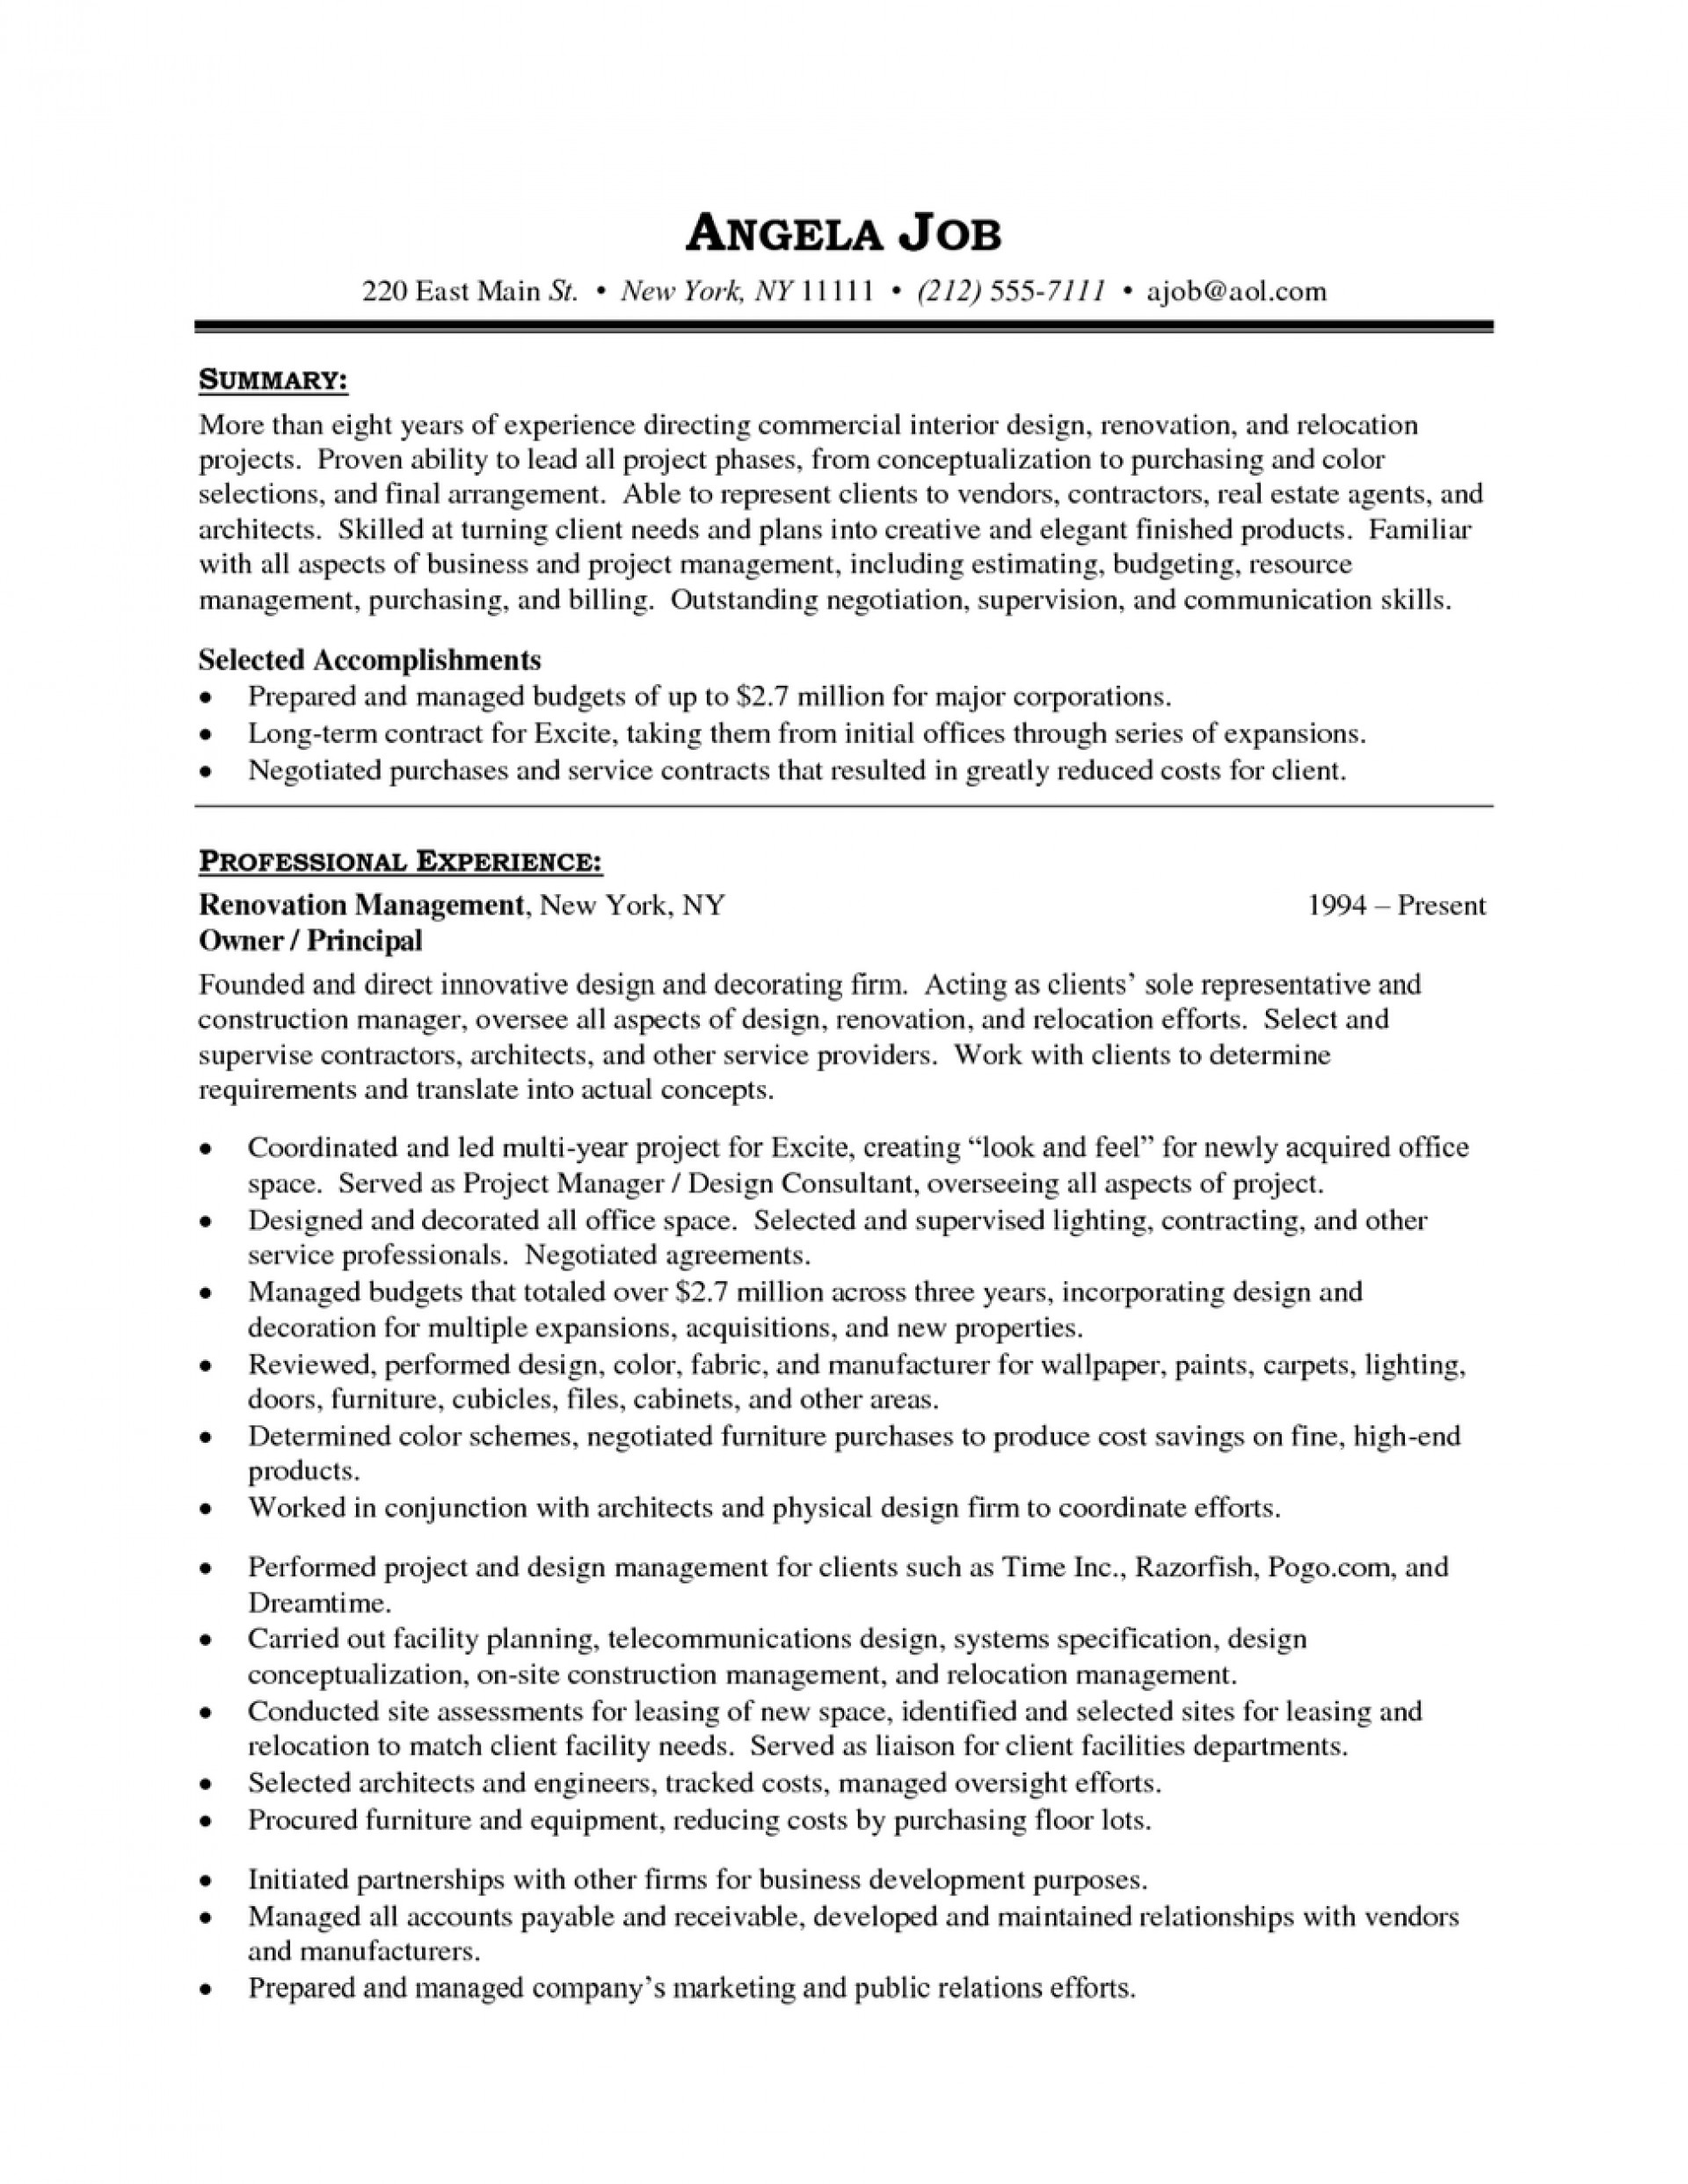 009 Essay Example Adoption Persuasive Speech Outline Topics Personalterior Design Assistant Resumeterior Exampleterior Designterior Websites Career Designing Staggering Public Relations White Paper Sample Research 1920